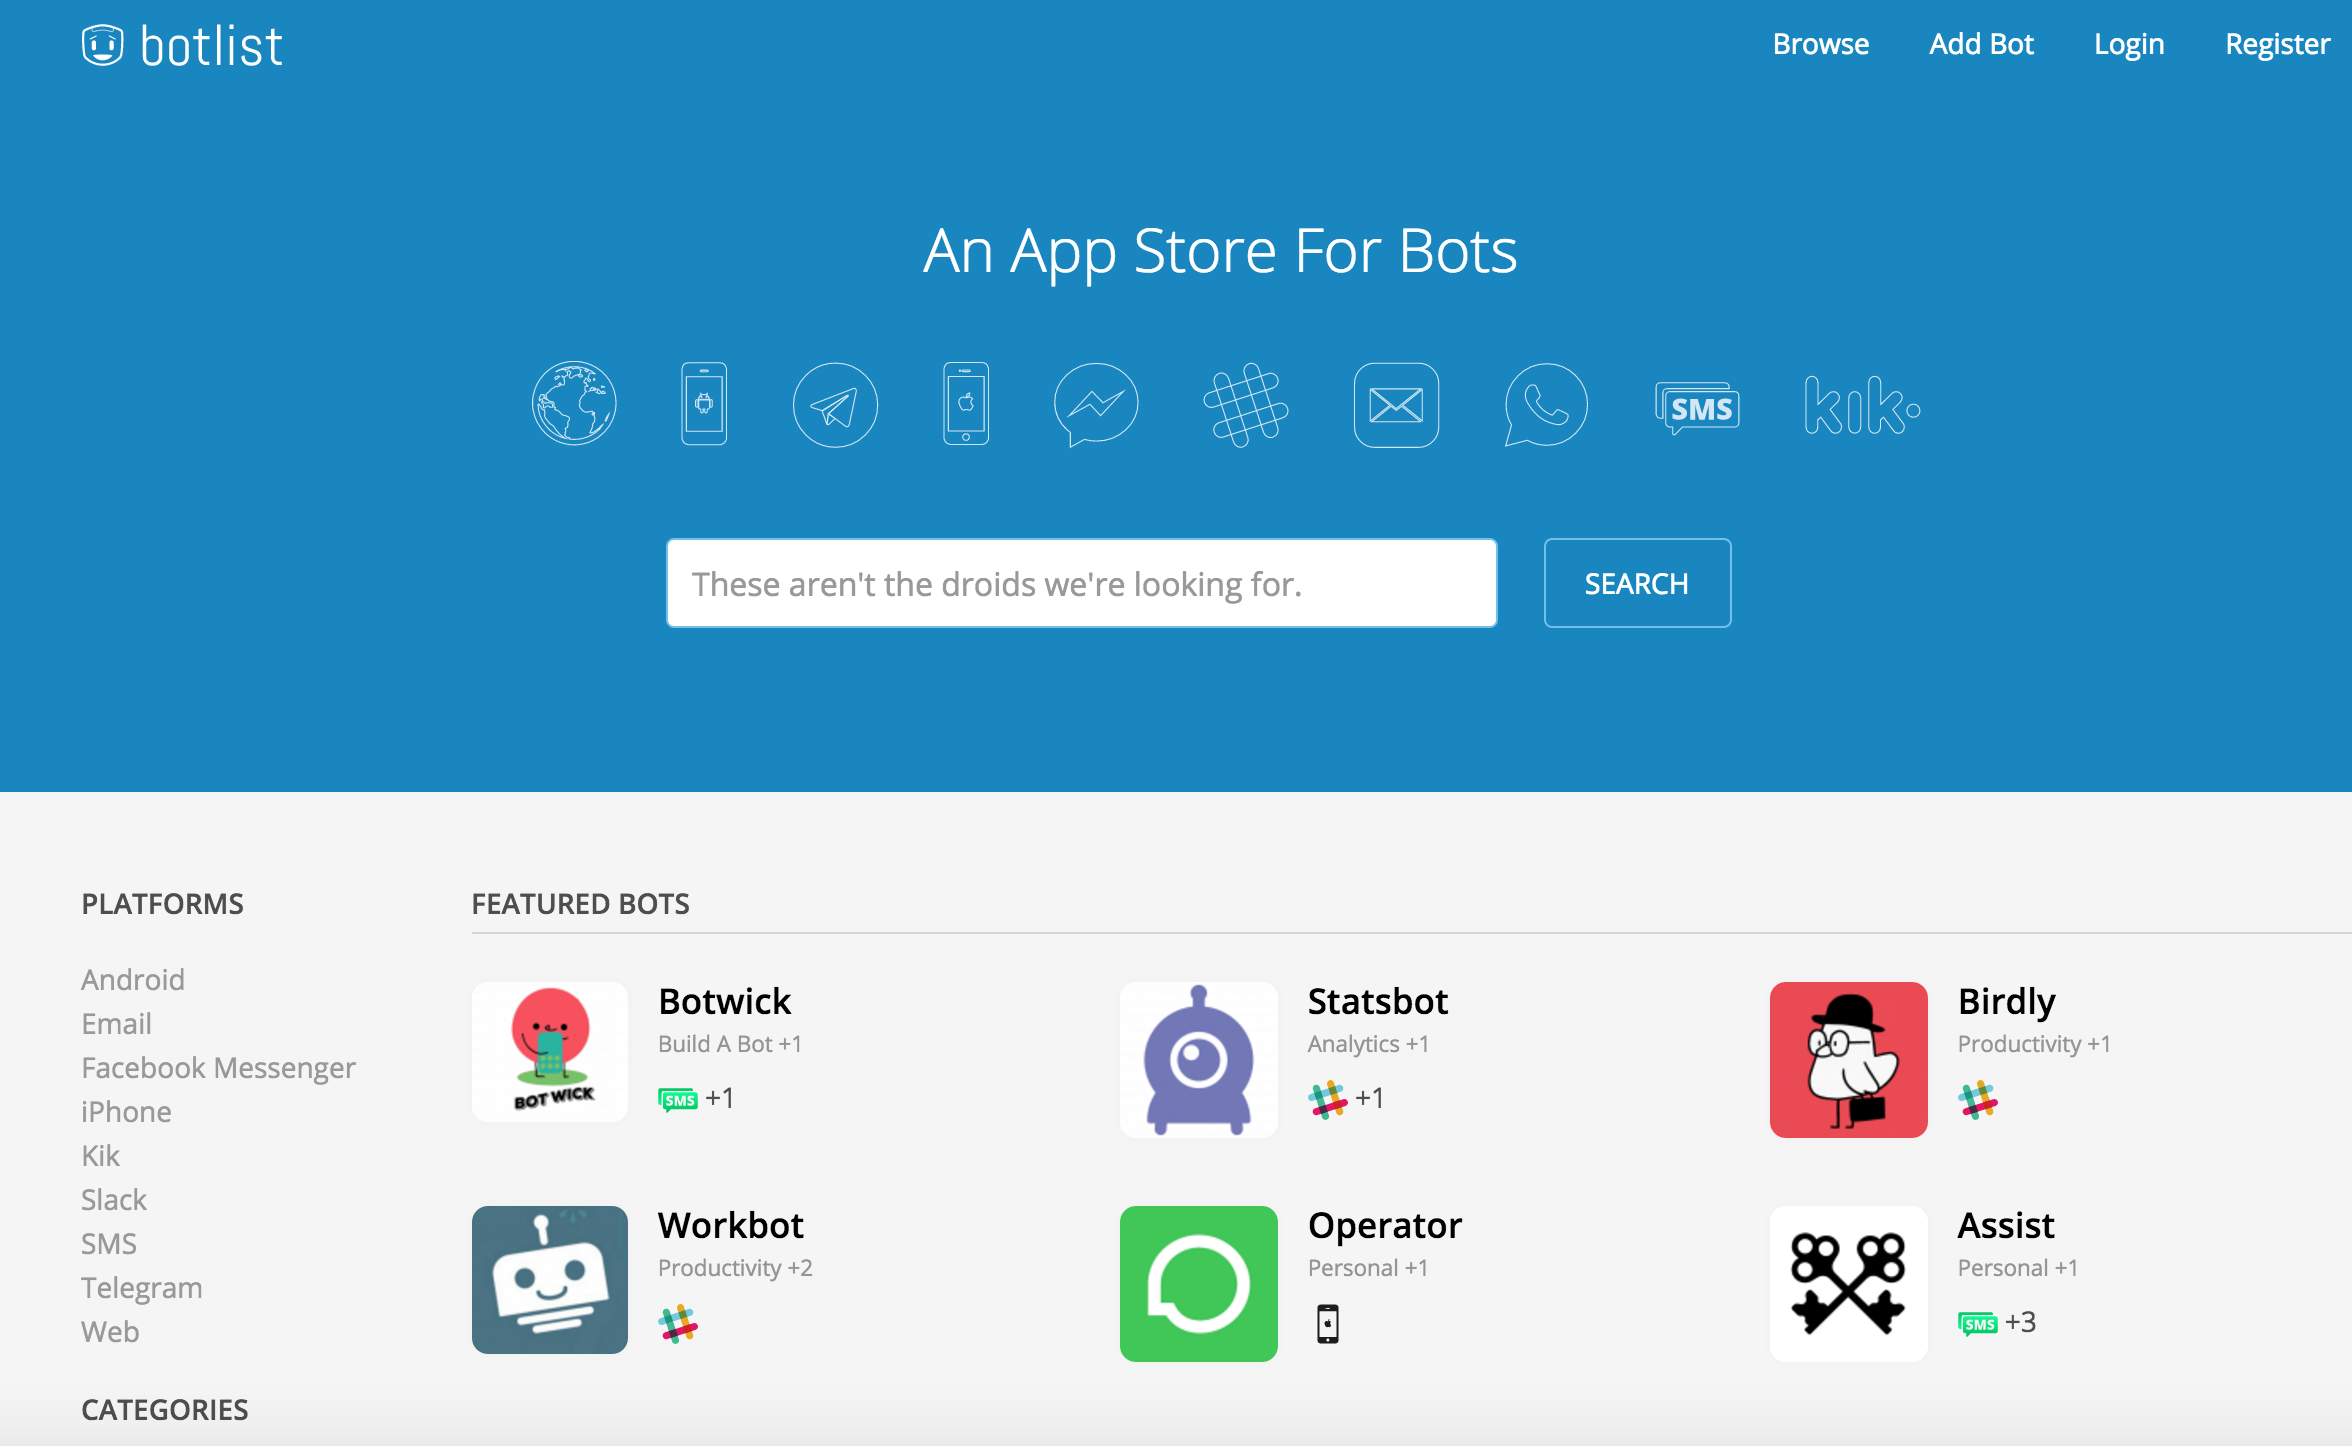 Botlist The App